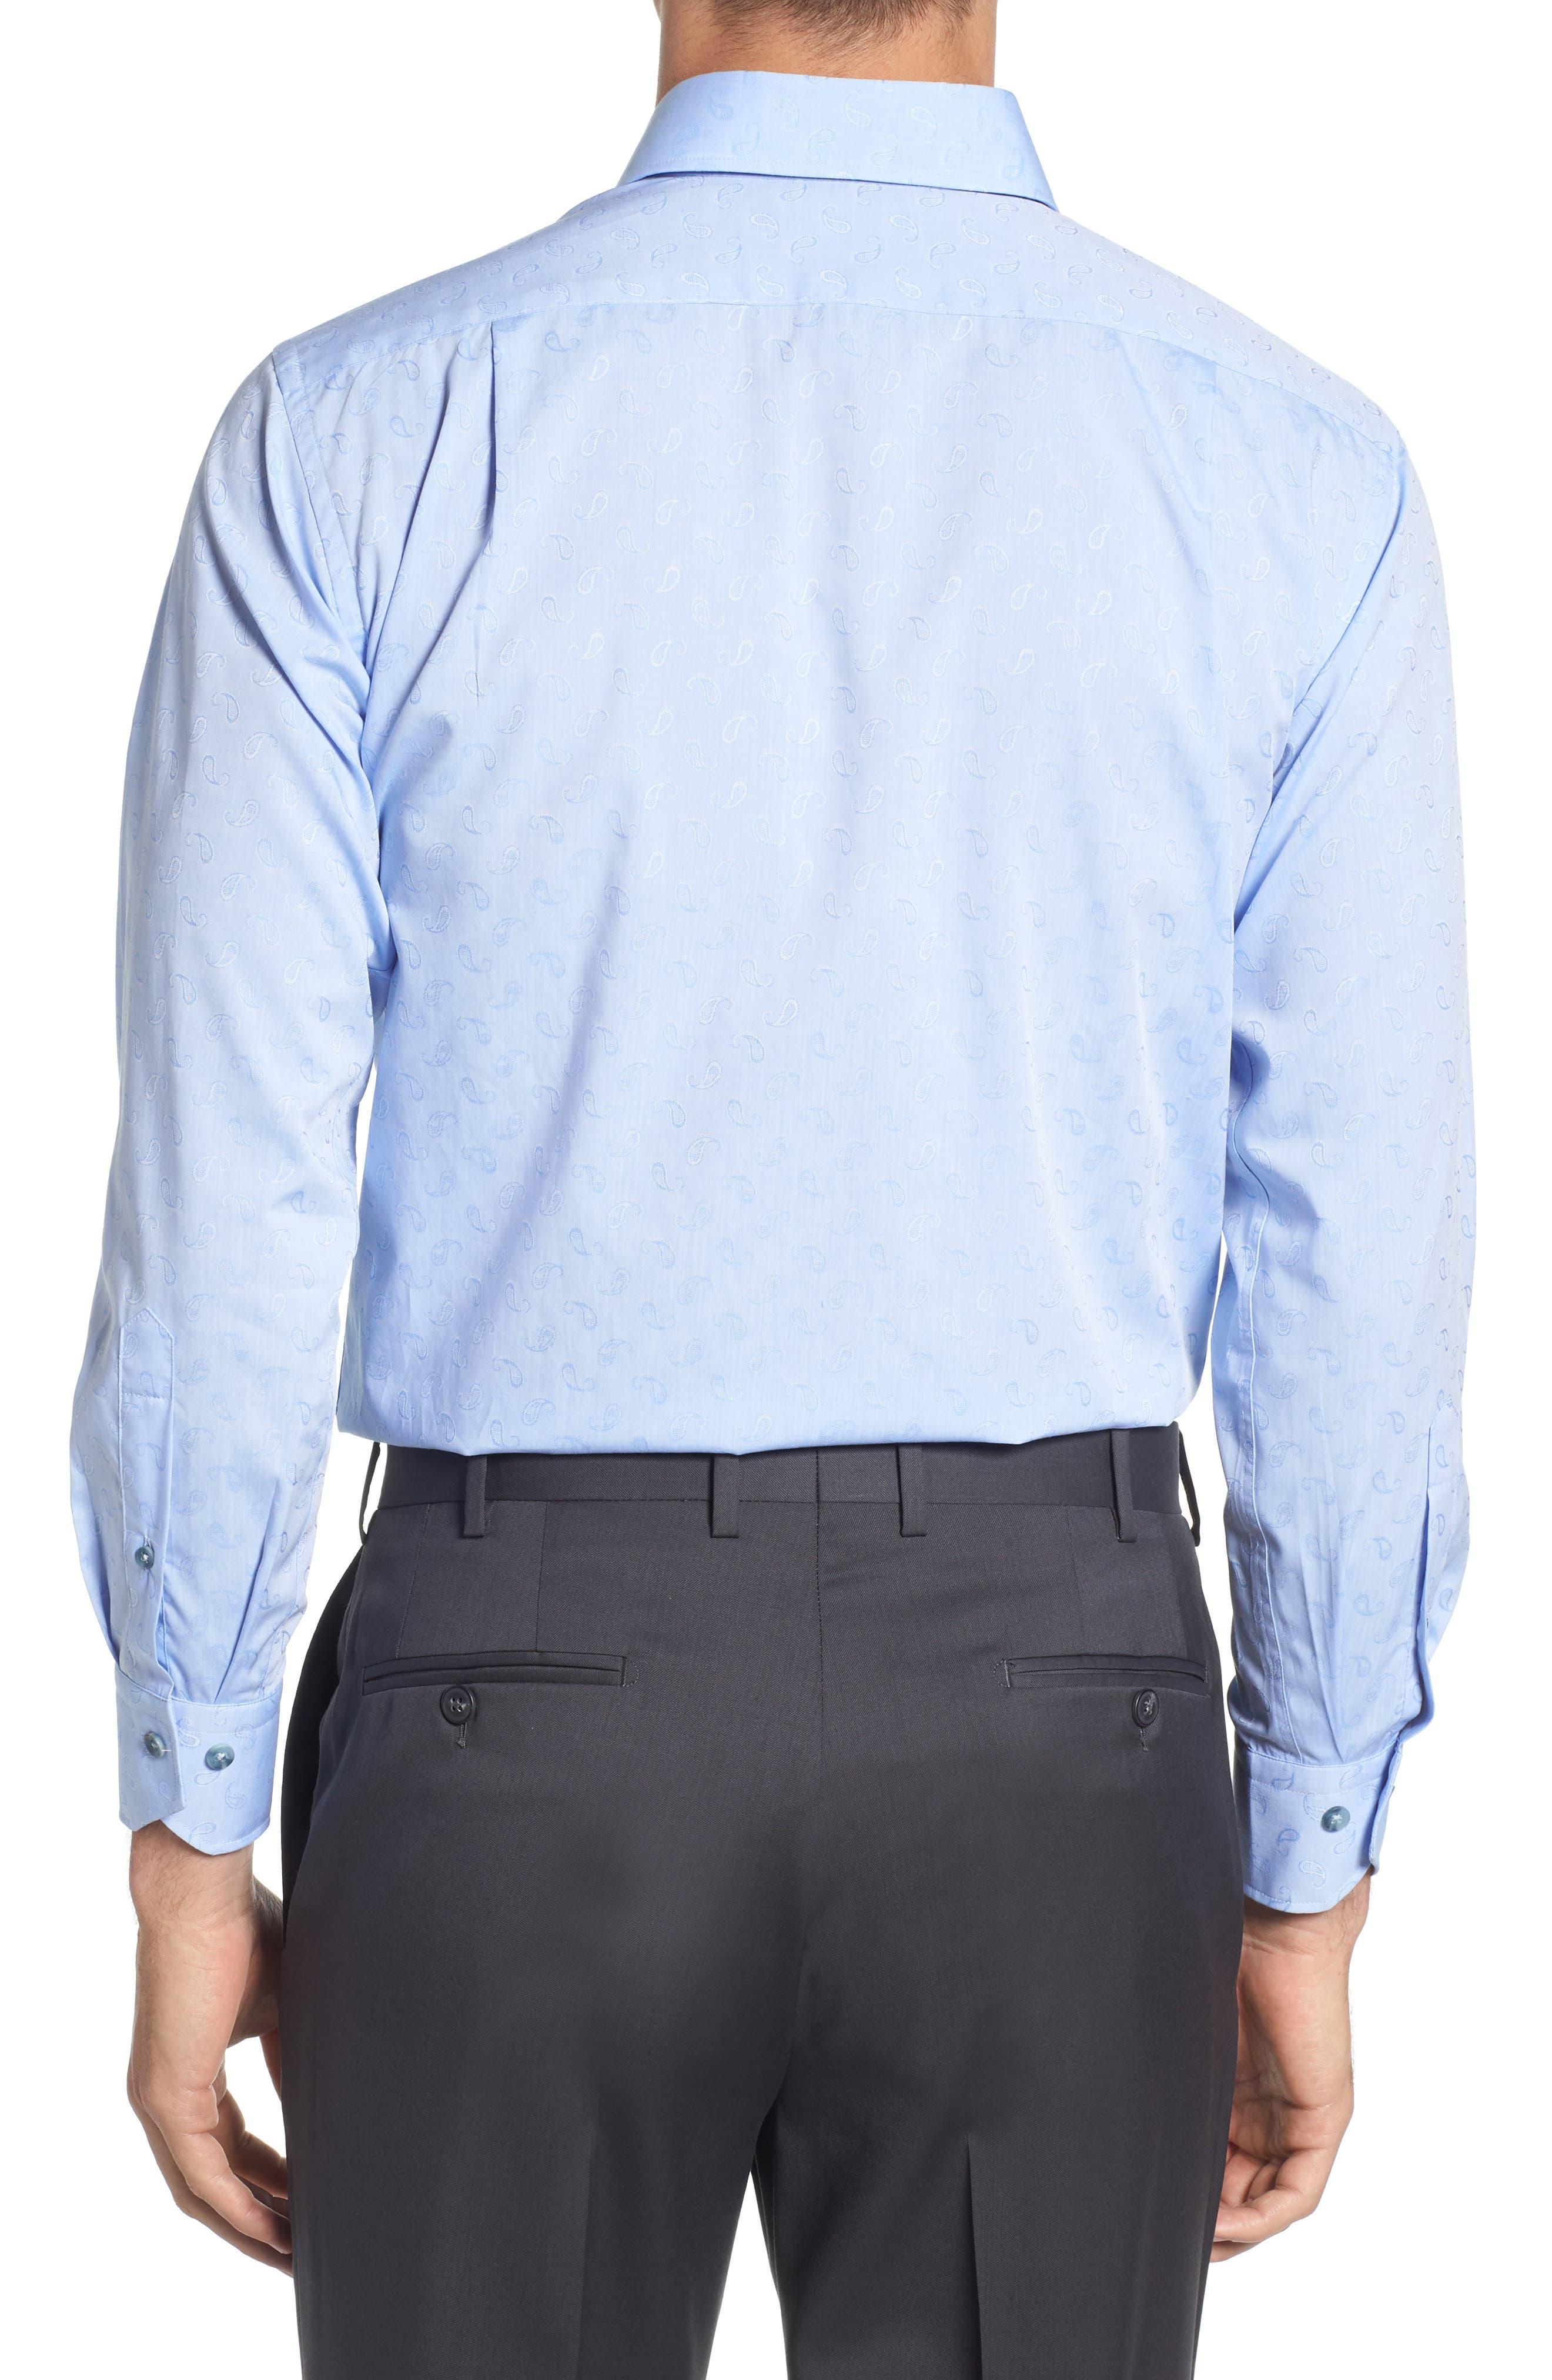 Trim Fit Paisley Dress Shirt,                             Alternate thumbnail 3, color,                             LIGHT BLUE